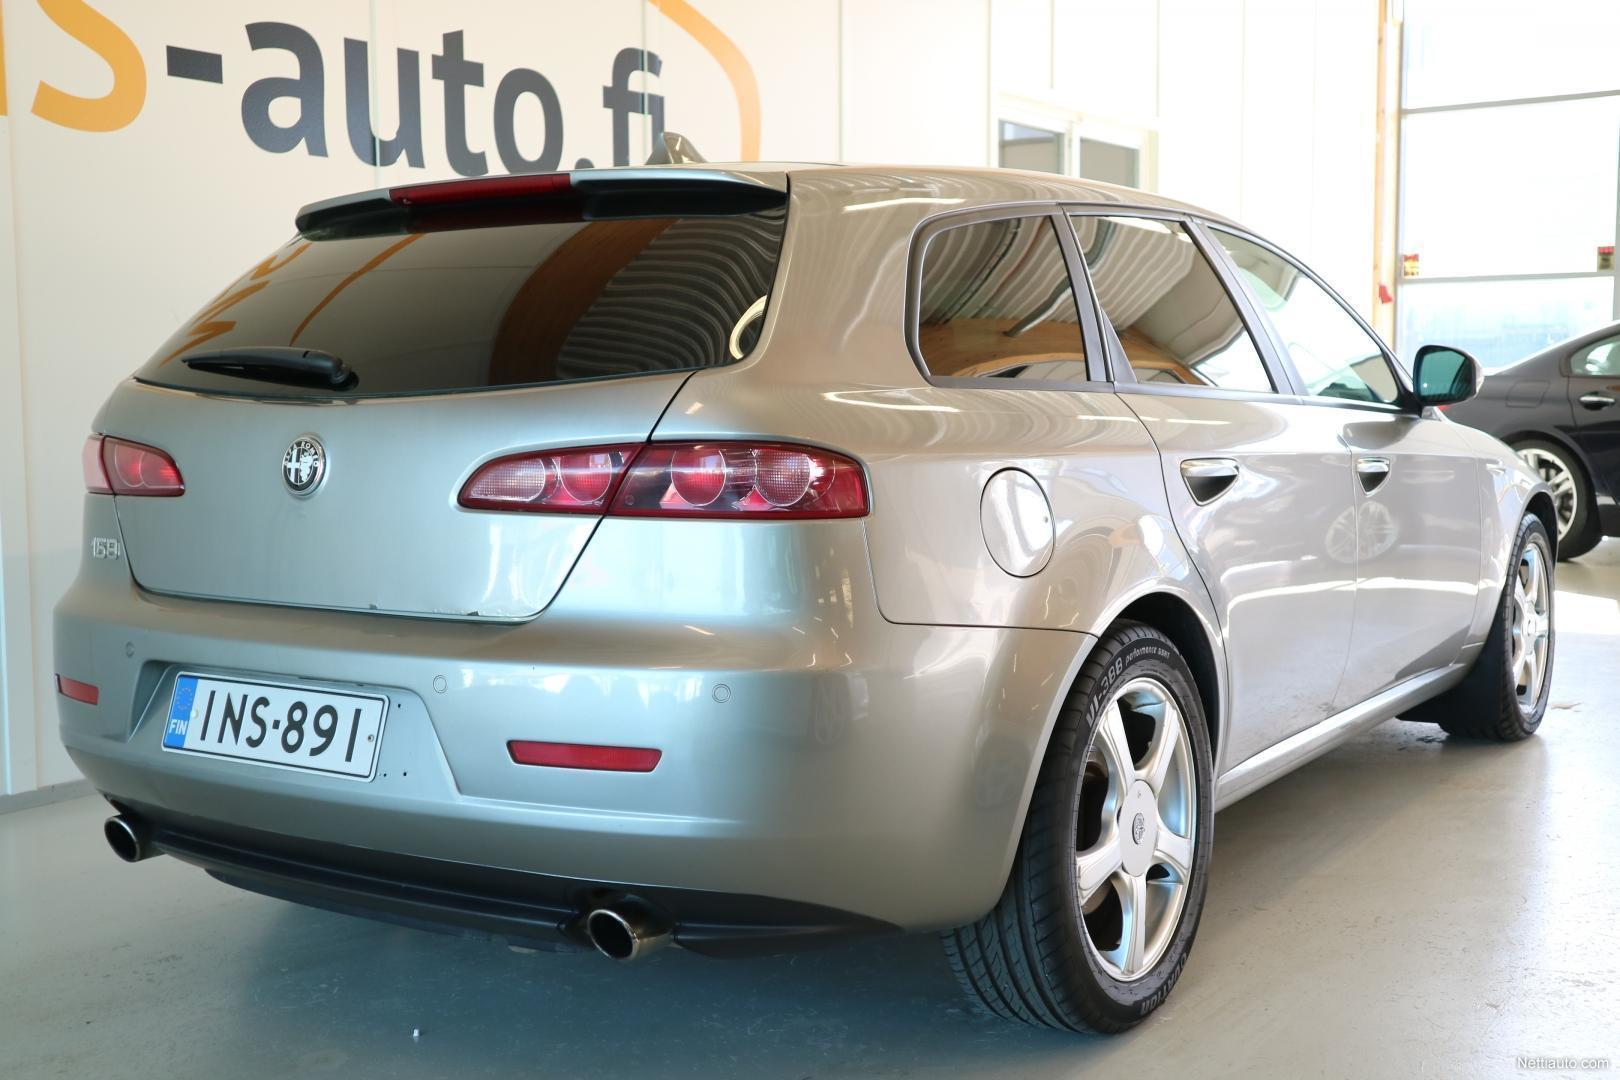 Alfa Auto Insurance >> Alfa Romeo 159 2 4 Jtdm Sportwagon 5d 200hv Farmari 2007